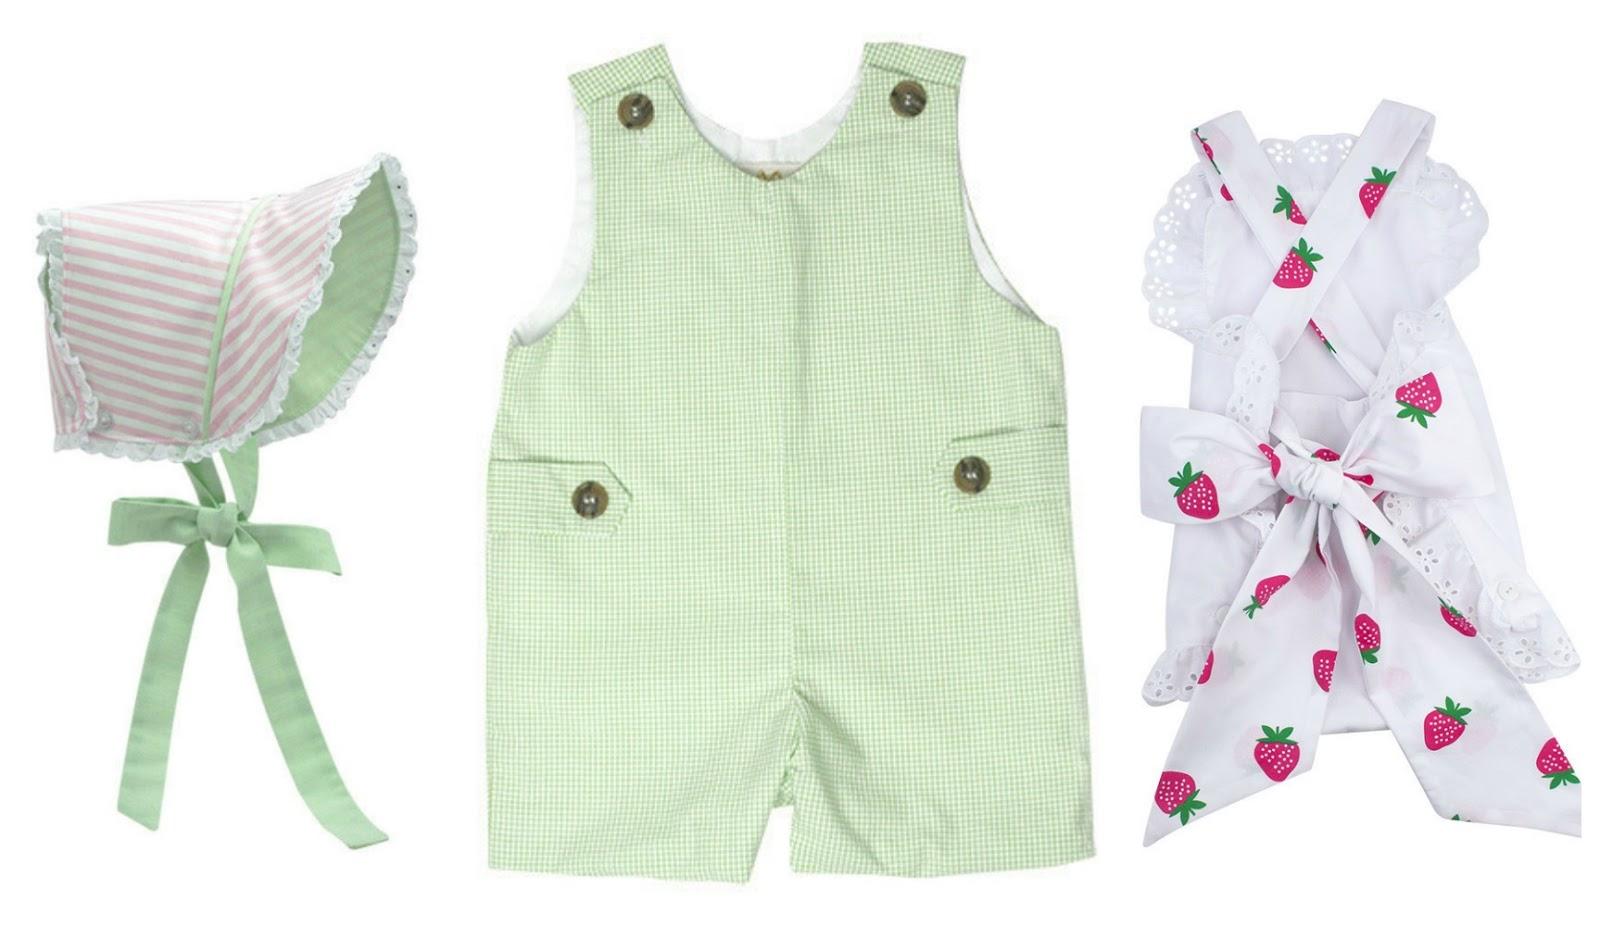 50f22d9ce1 Children's Clothes   The Beaufort Bonnet Company - Home of Malones